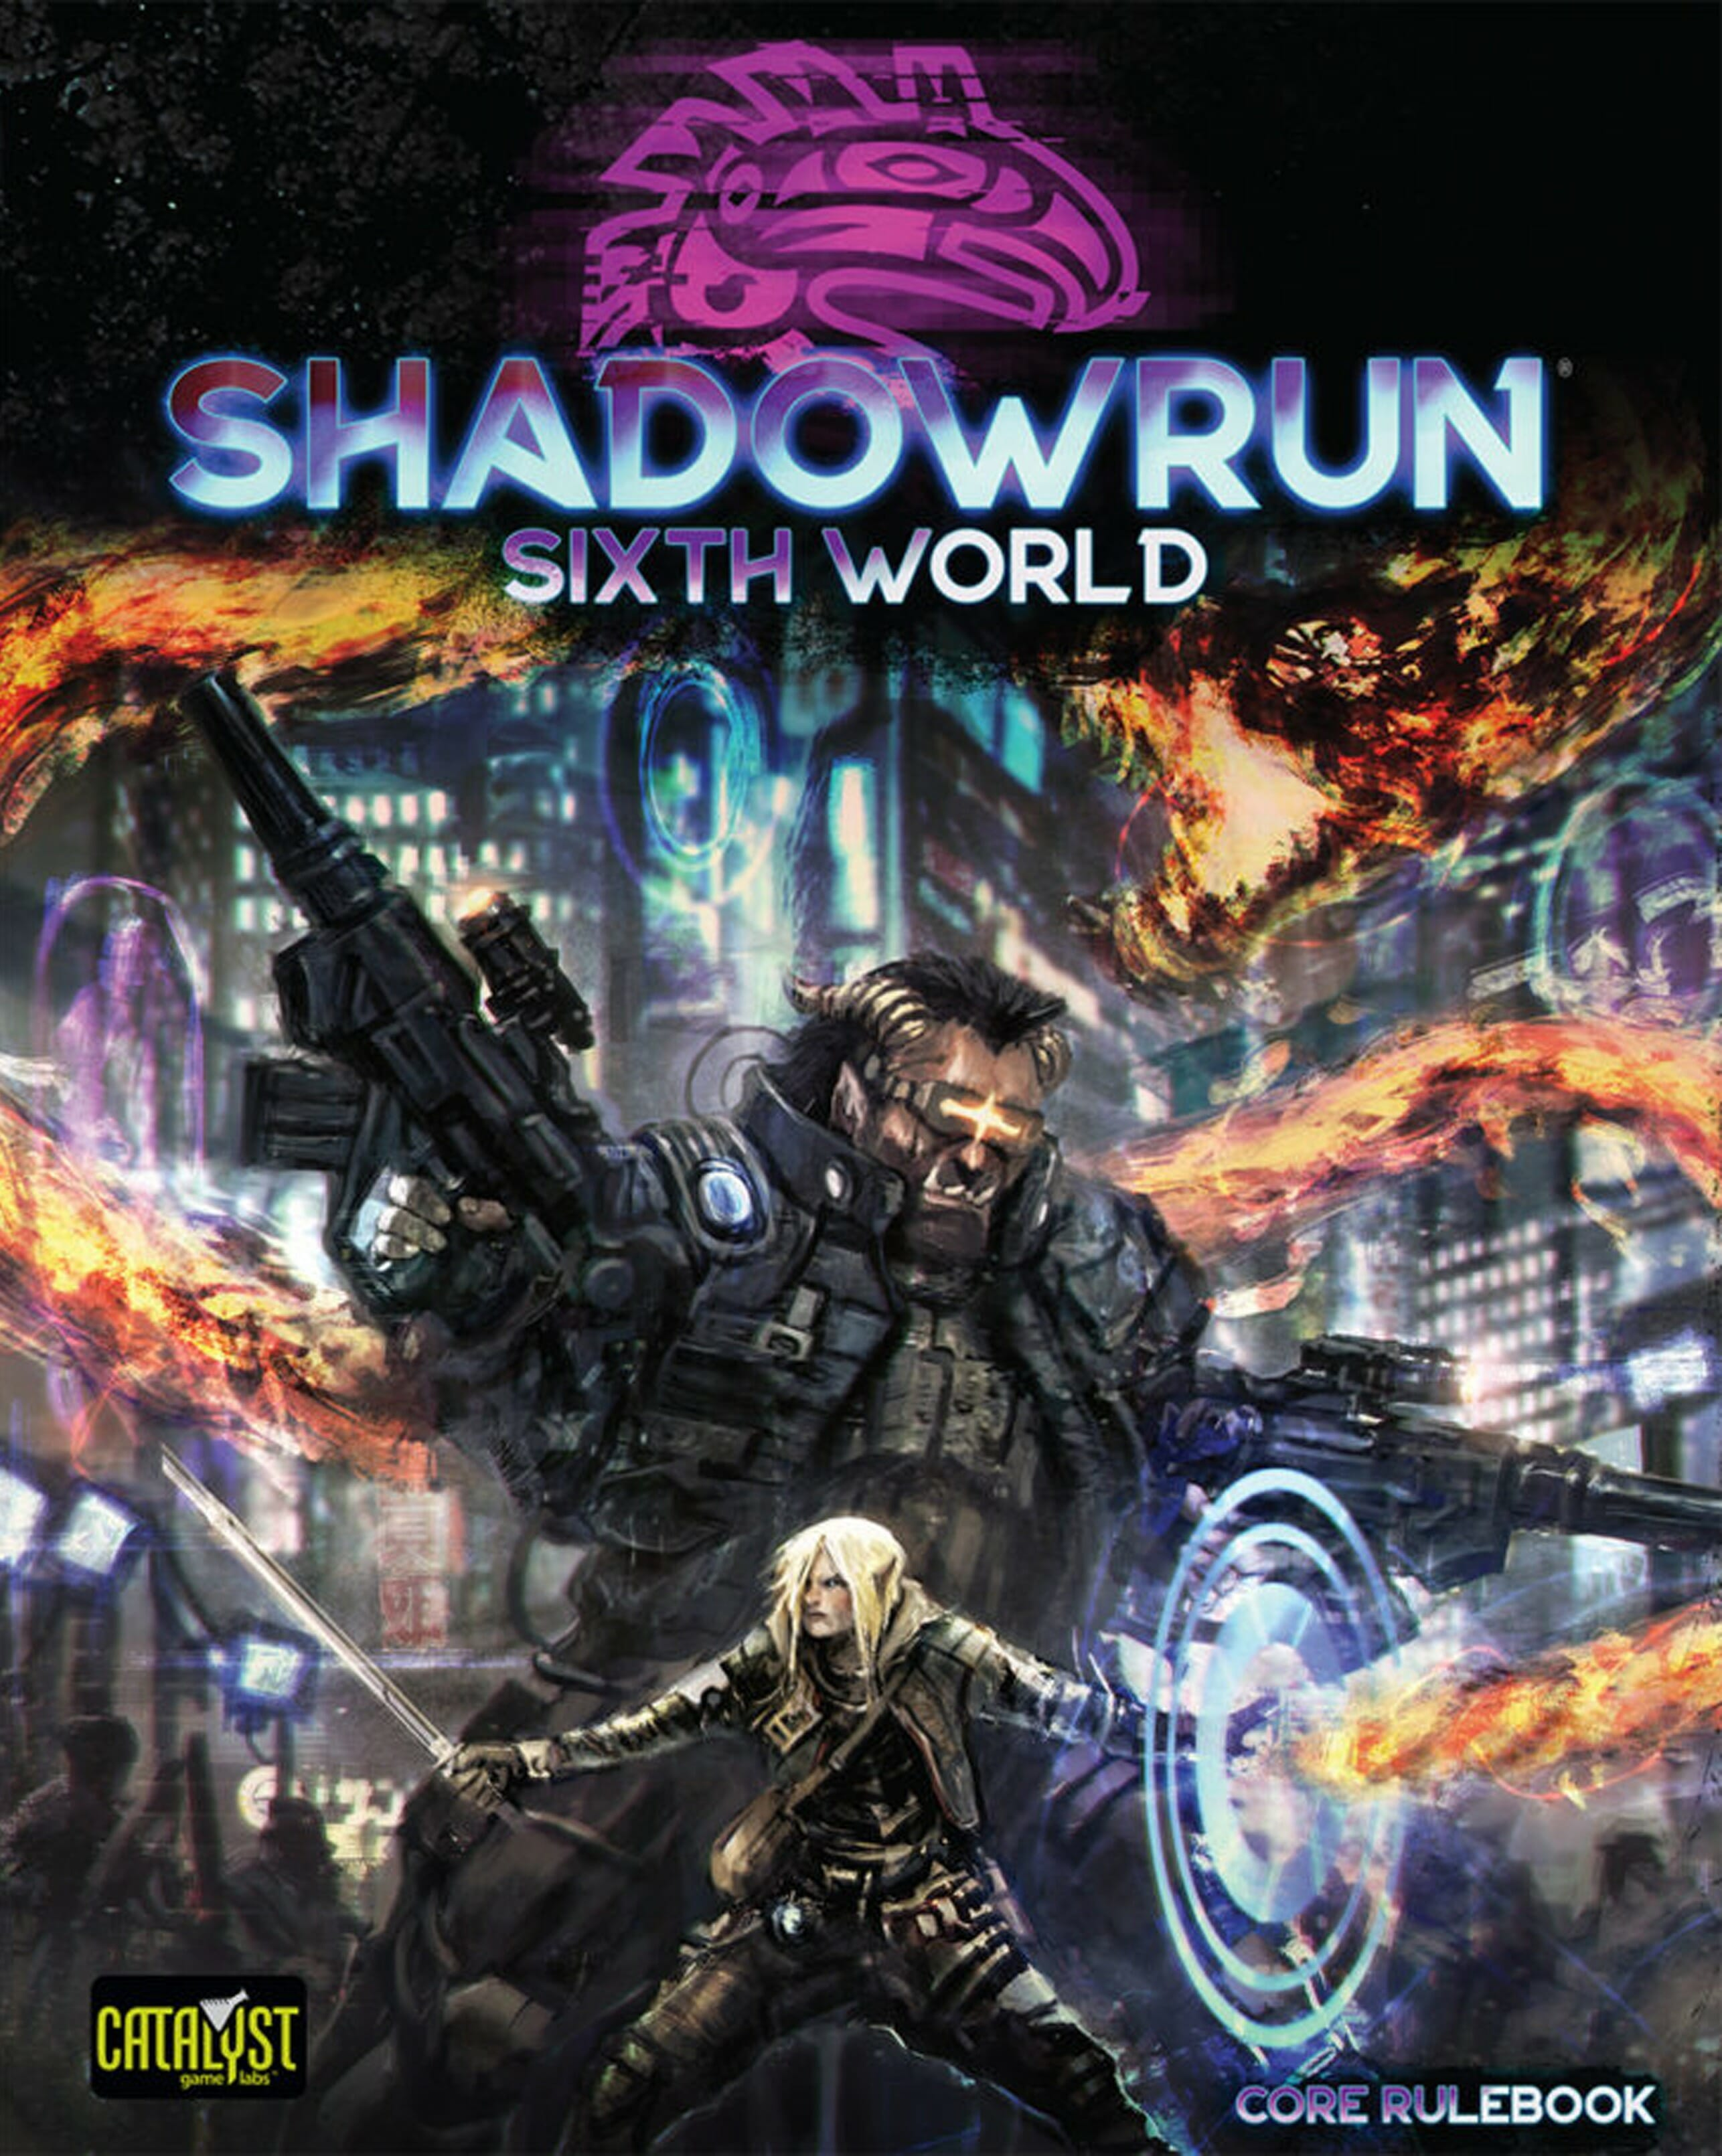 Shadowrun: Sixth World finally takes pre-orders